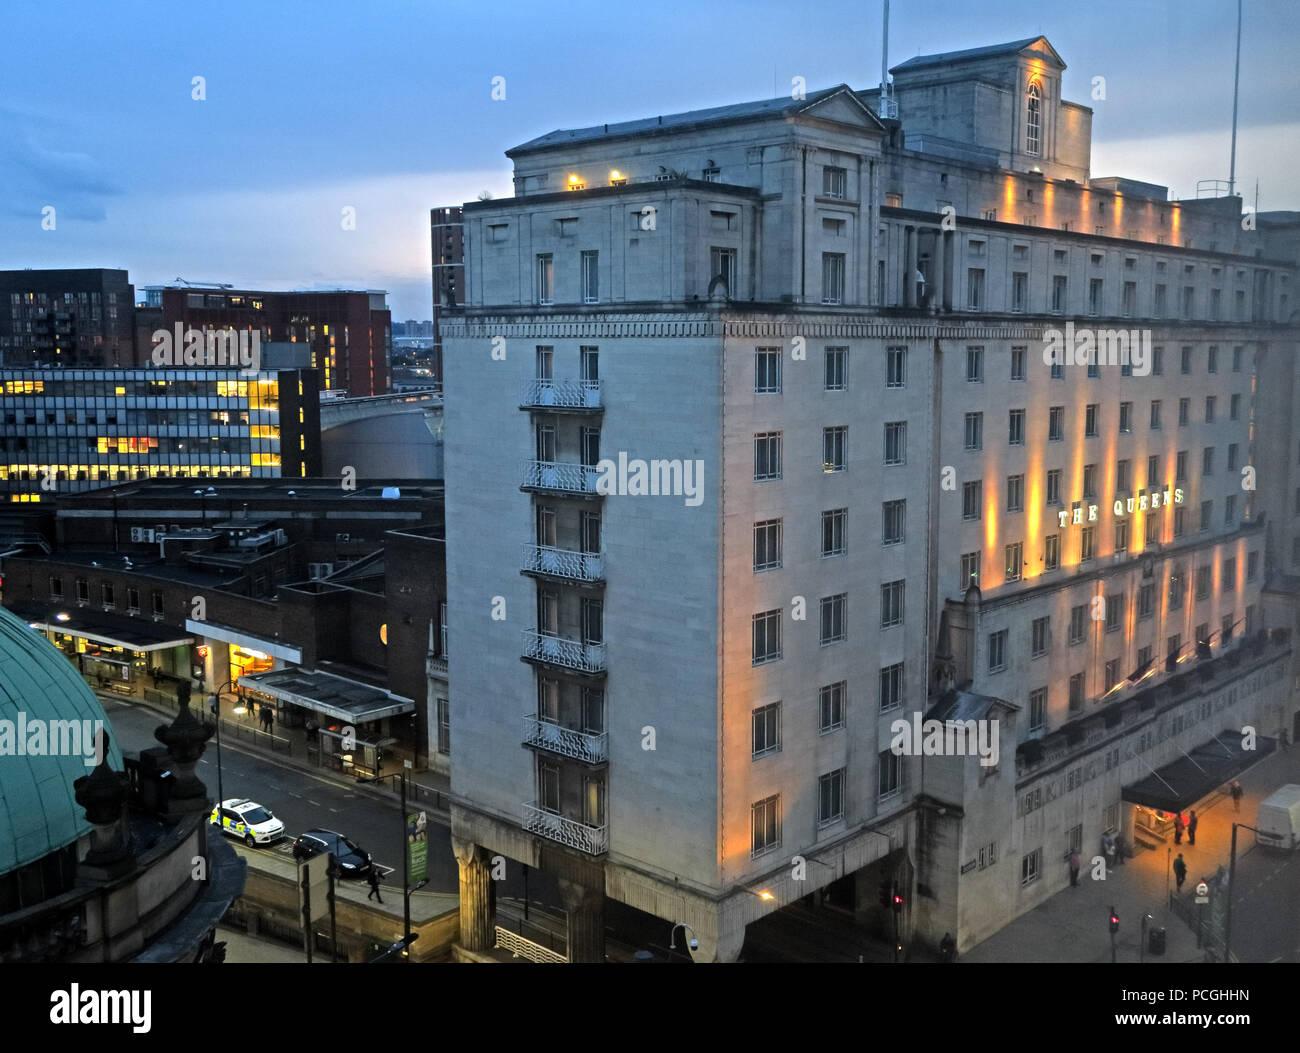 Laden Sie dieses Alamy Stockfoto Zentrum der Stadt Leeds, West Yorkshire, England, LS1, UK - PCGHHN